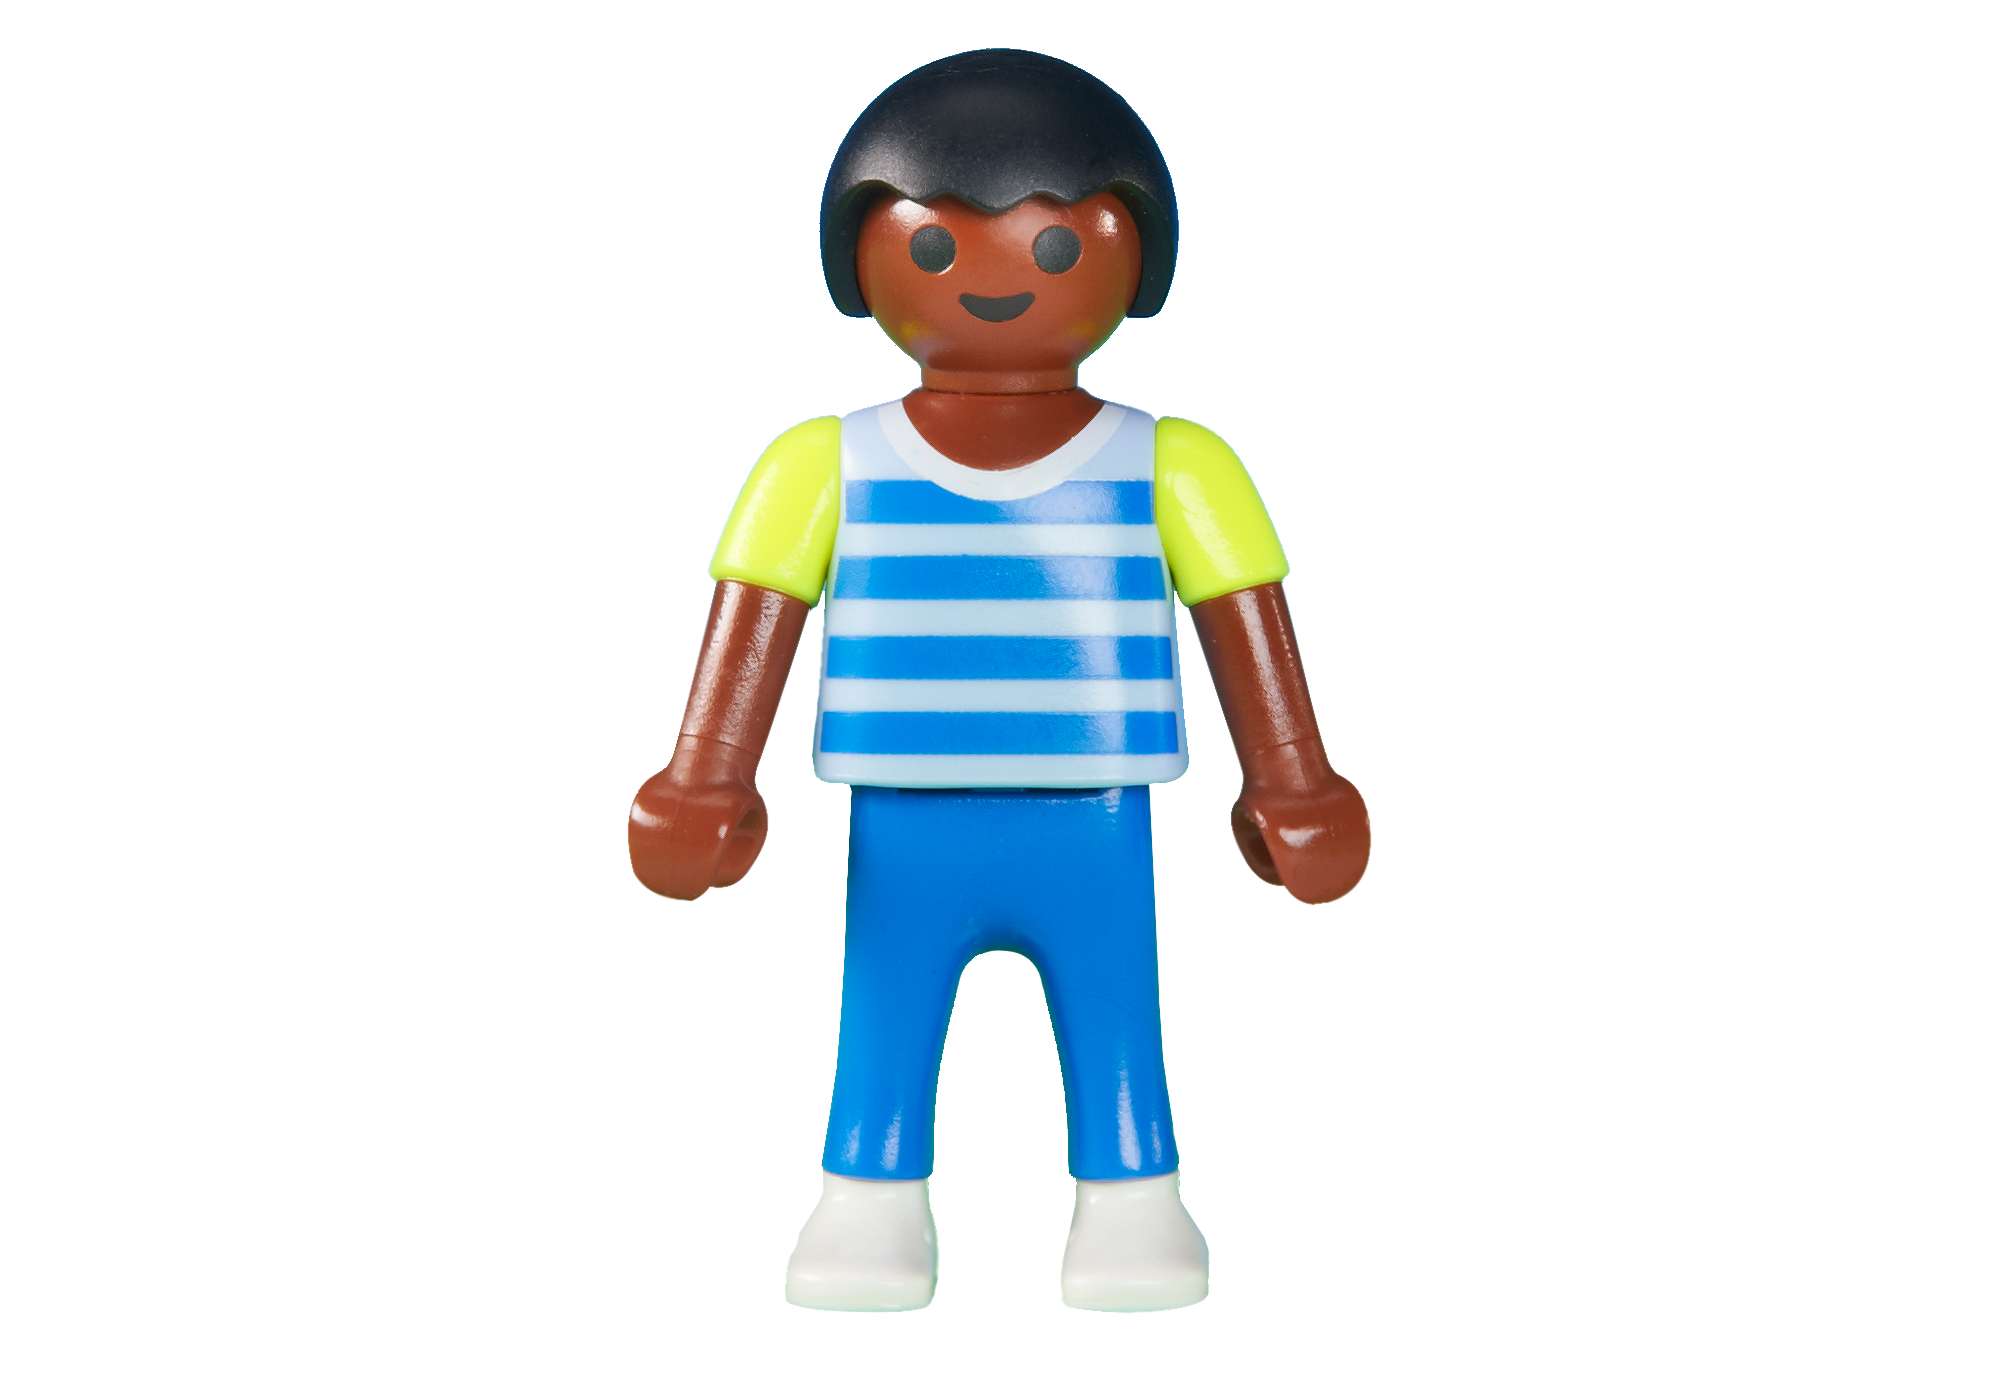 http://media.playmobil.com/i/playmobil/30102460_product_detail/Grundfigur Junge